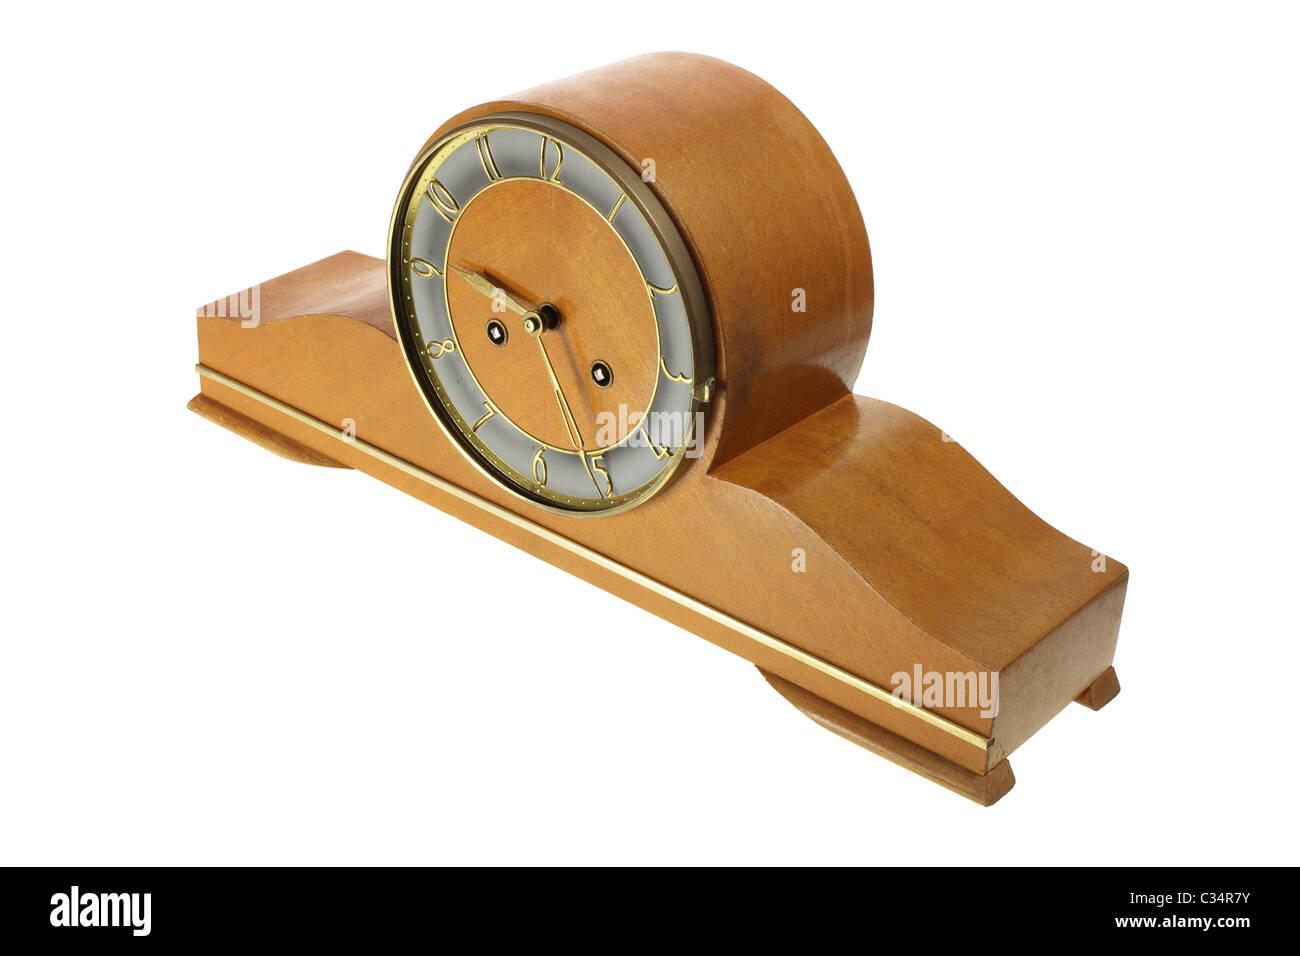 Mantle Clock - Stock Image